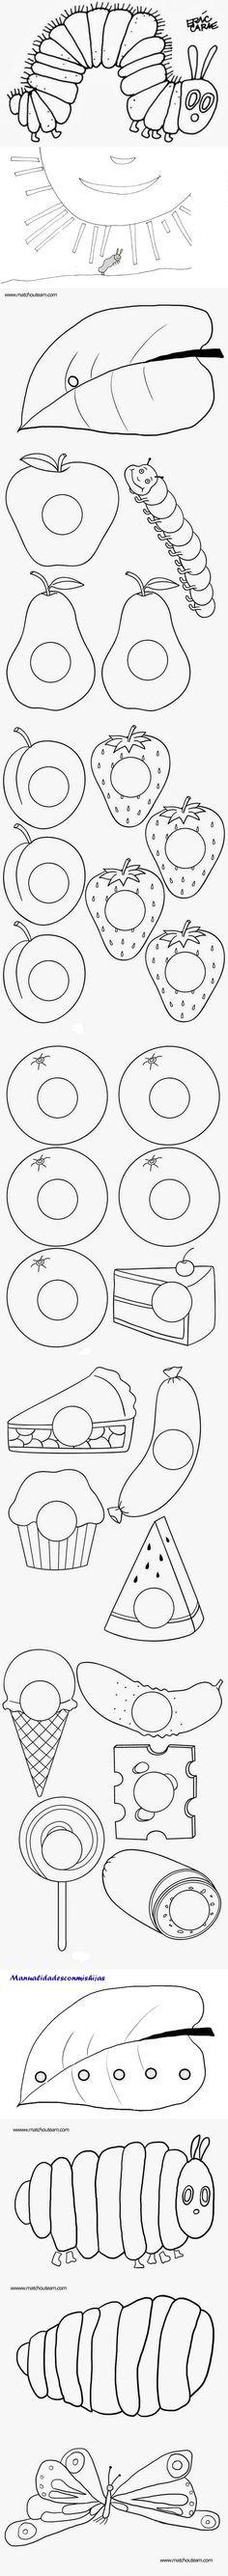 Mejores 307 imágenes de la oruga glotona en Pinterest en 2018 | Eric ...